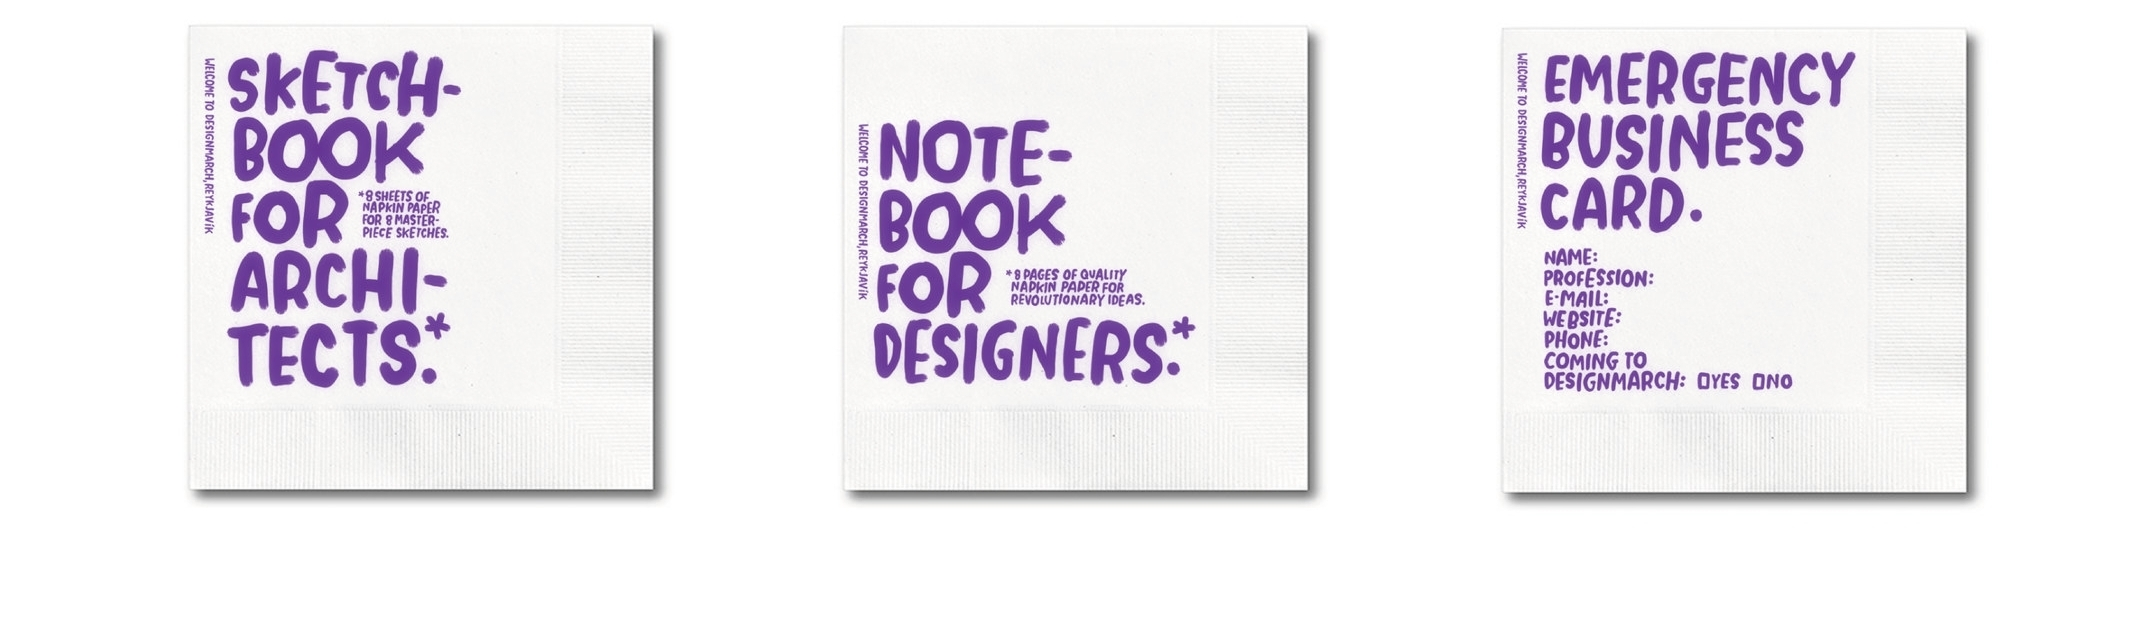 Design+a+March+brand+identity+|+tomasdottir.+|+logo+design,+pattern+design,+online+marketing,+festival+design,+branding,+illustration,+modern,+napkins+design